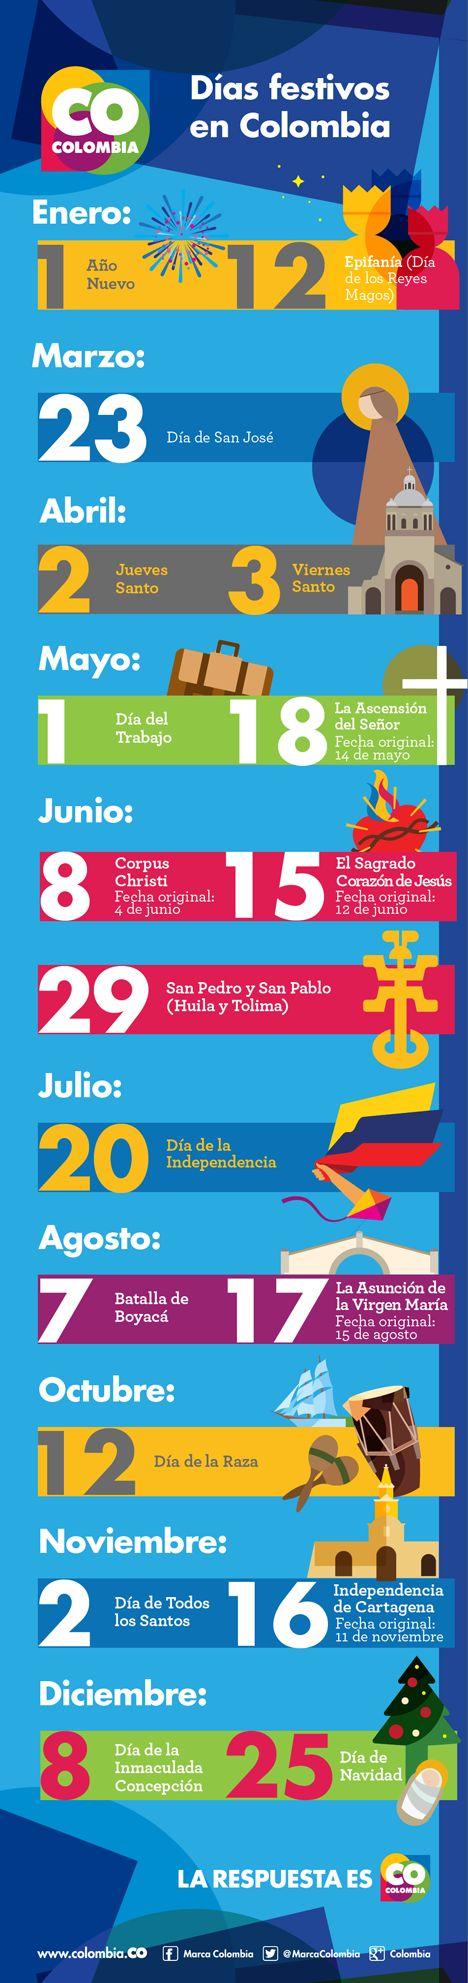 infografia-festivos-Colombia-2015